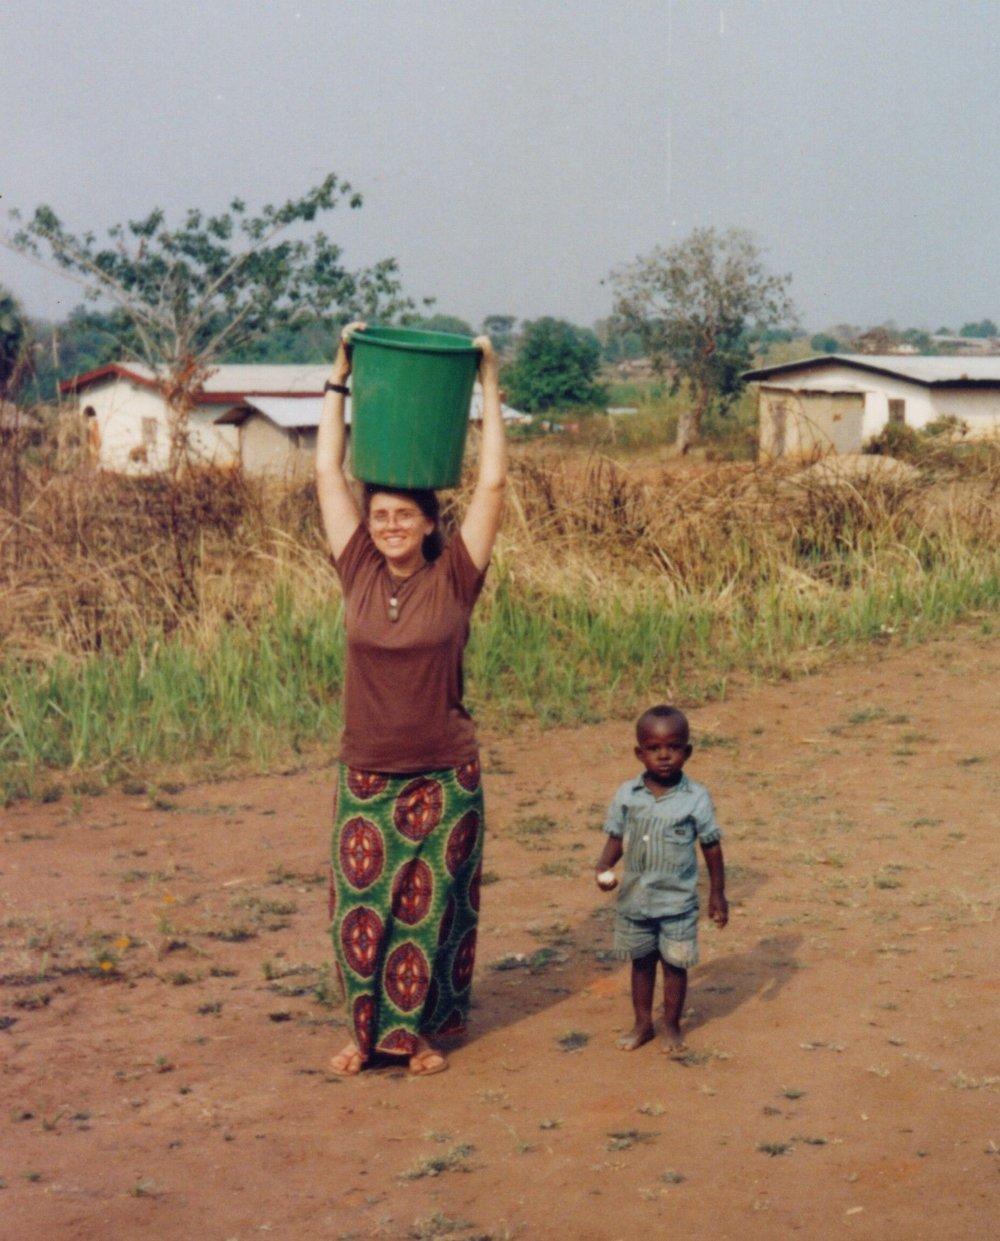 NAOMI KOVACSPresident - CAMEROON 1995-1998Community DevelopmentLanguages spoken during service: French & Fulfulde